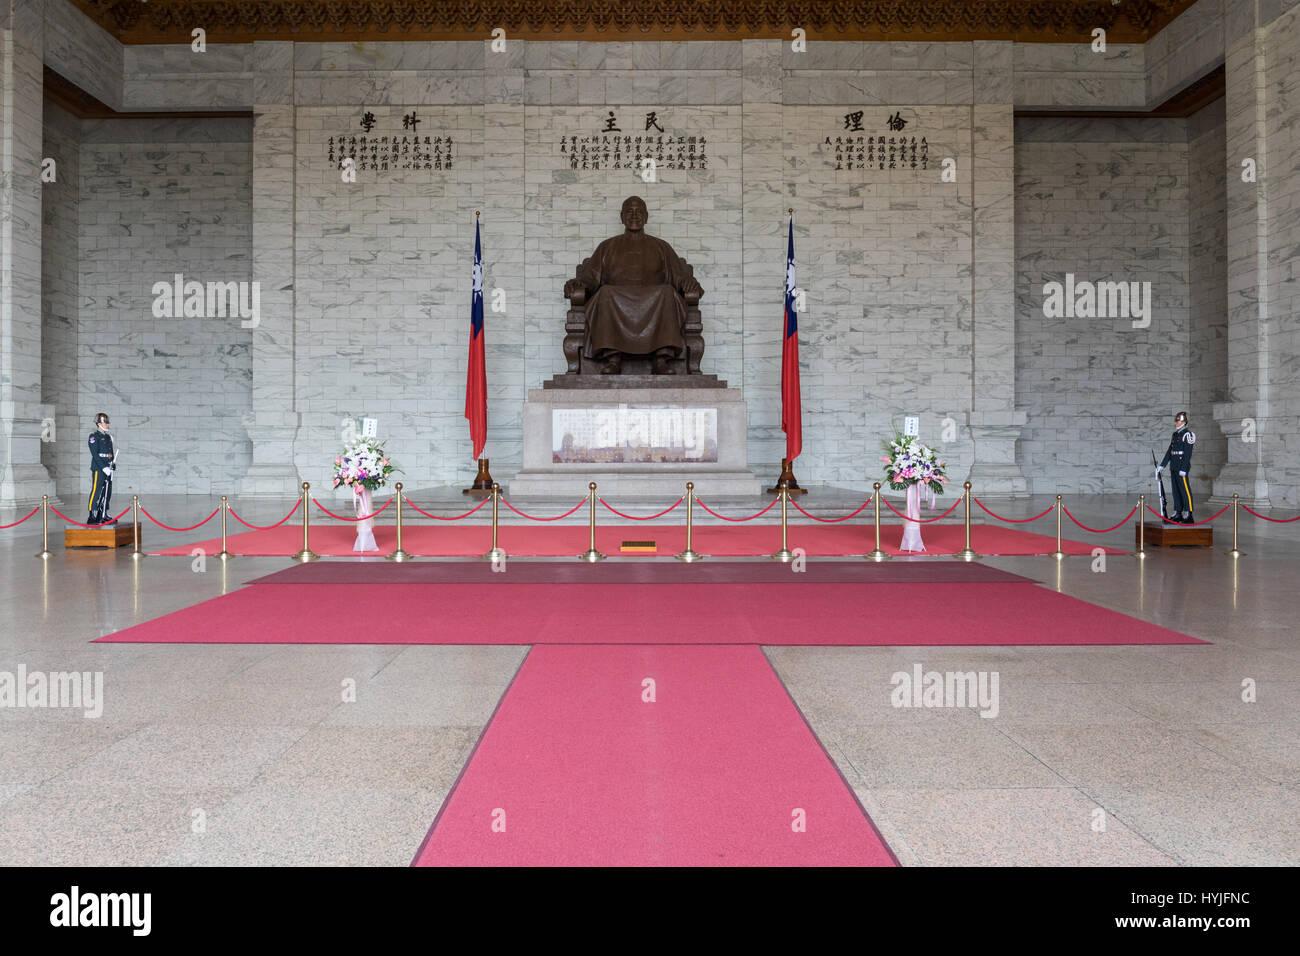 Taipei, Taiwan. 5th April, 2017. Two members of the honor guard at the Chiang Kai-shek Memorial Hall in Taipei, - Stock Image